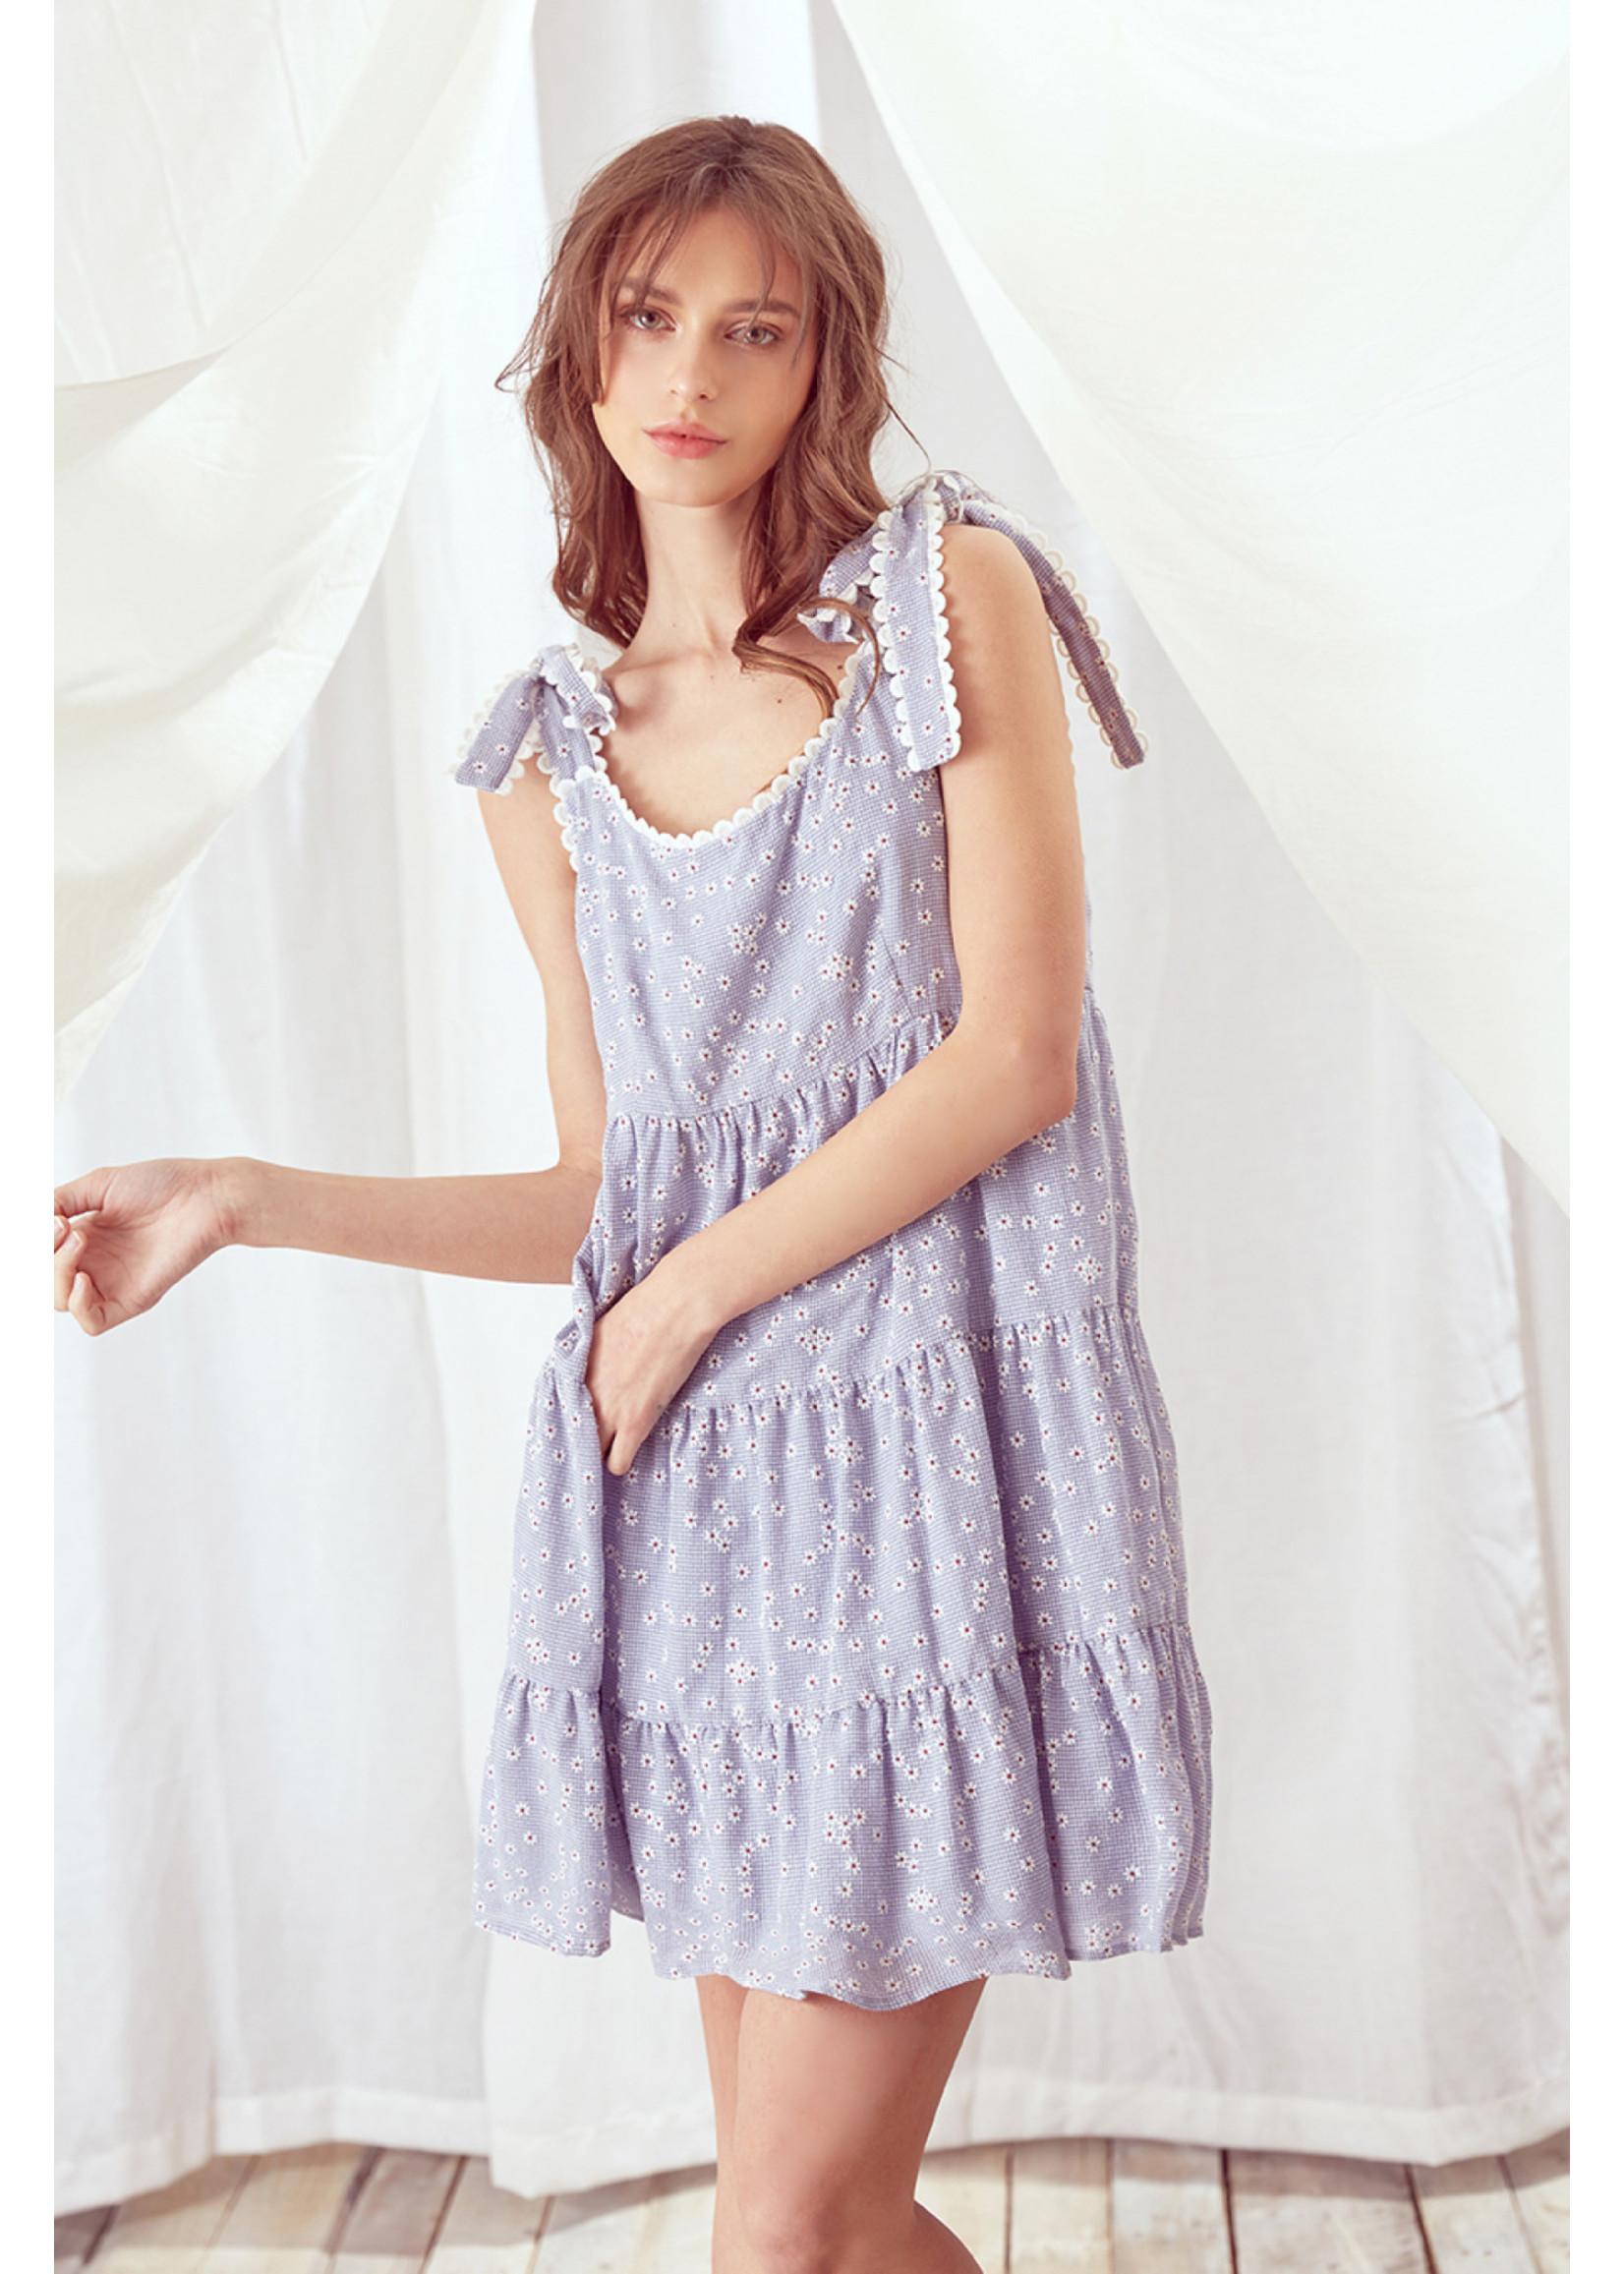 Storia Daisy Print Scalloped Mini Dress - JD3213